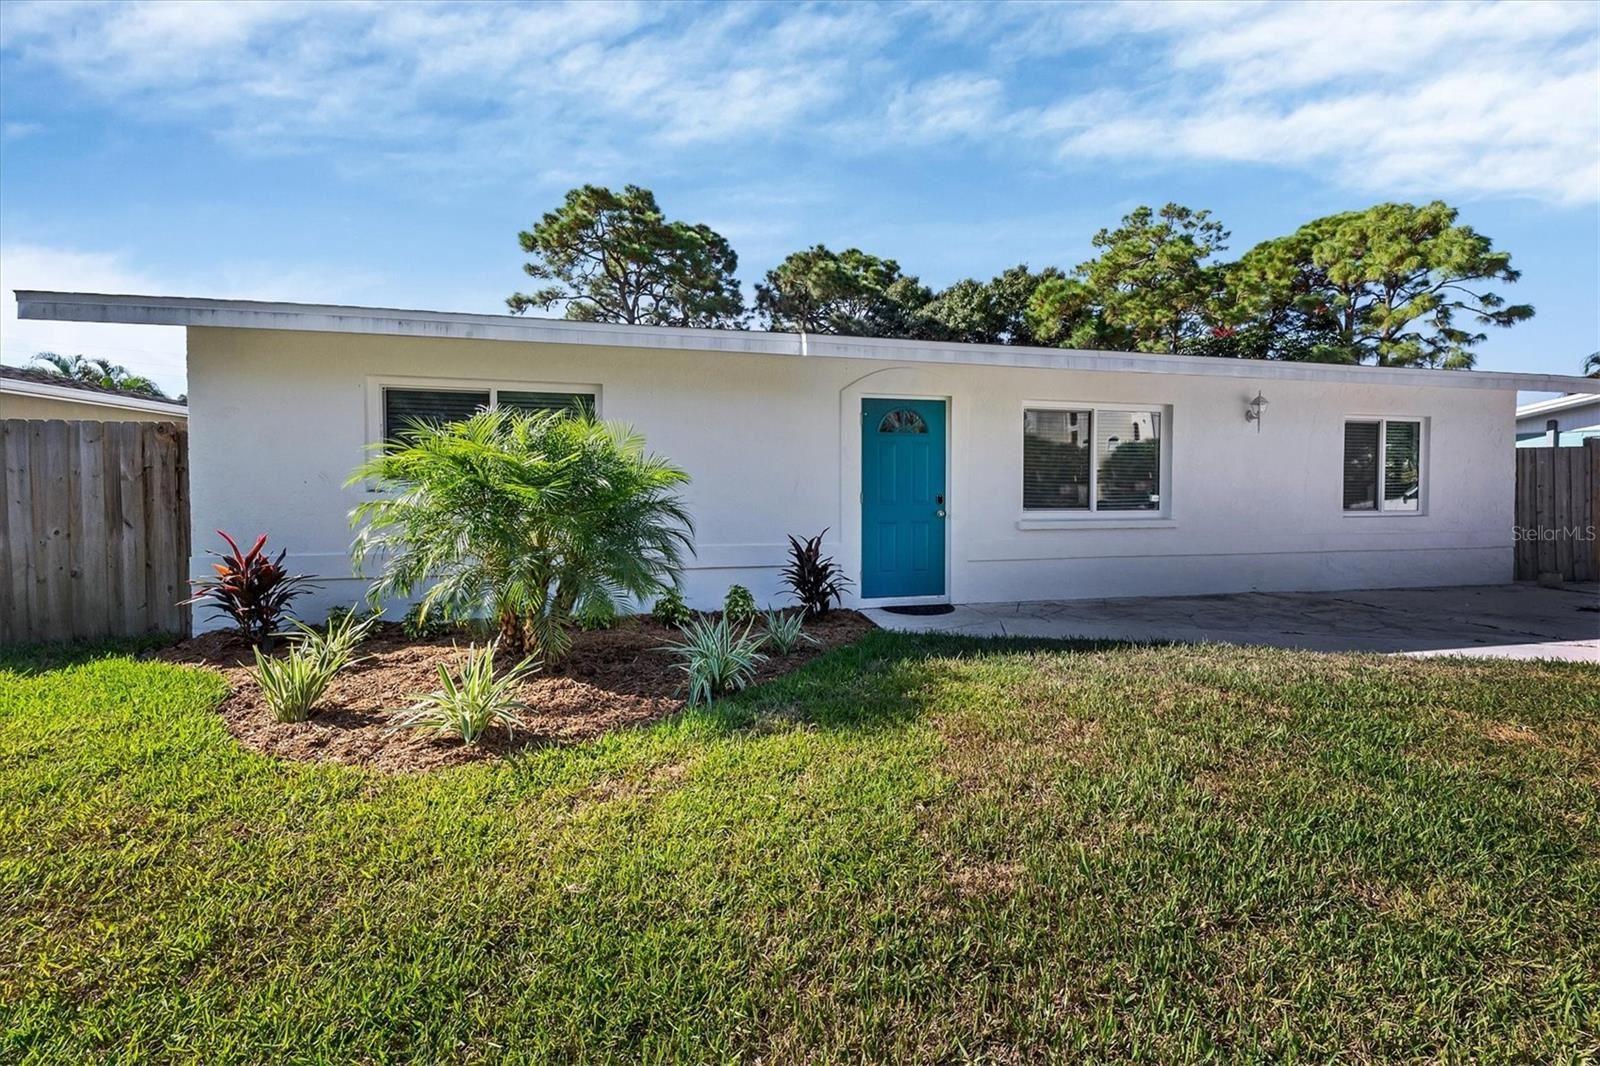 Photo of 320 FIELD AVENUE E, VENICE, FL 34285 (MLS # N6117920)